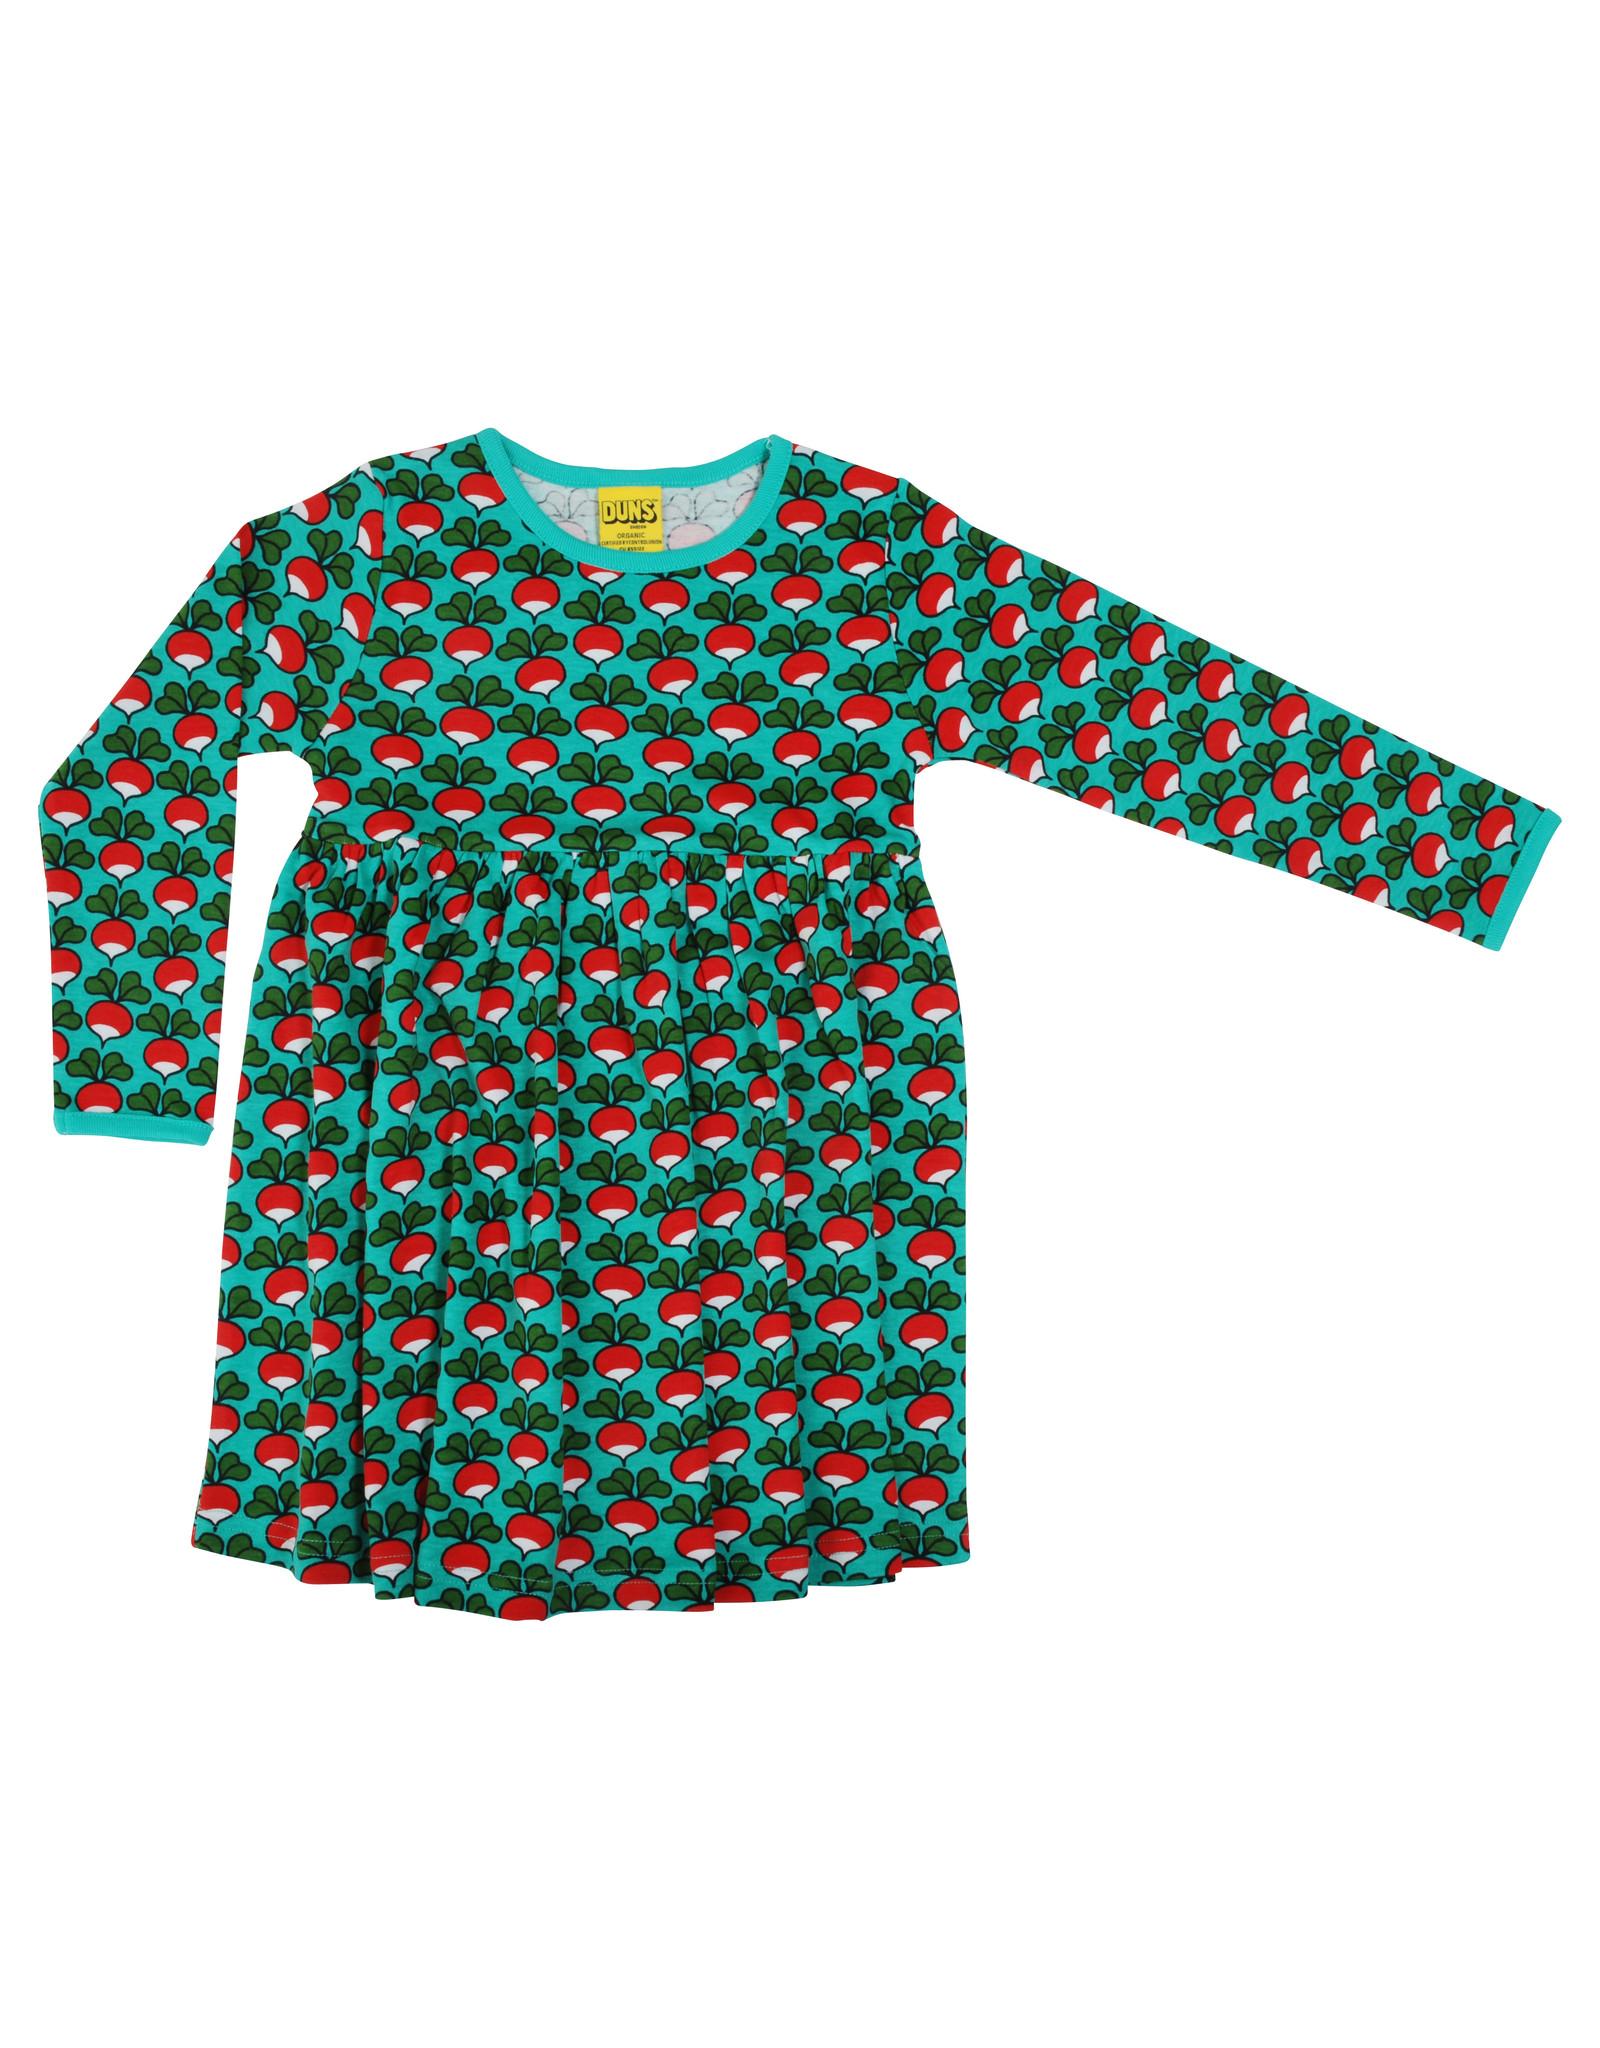 Duns Kinder 'zwier' jurk - radijsjes